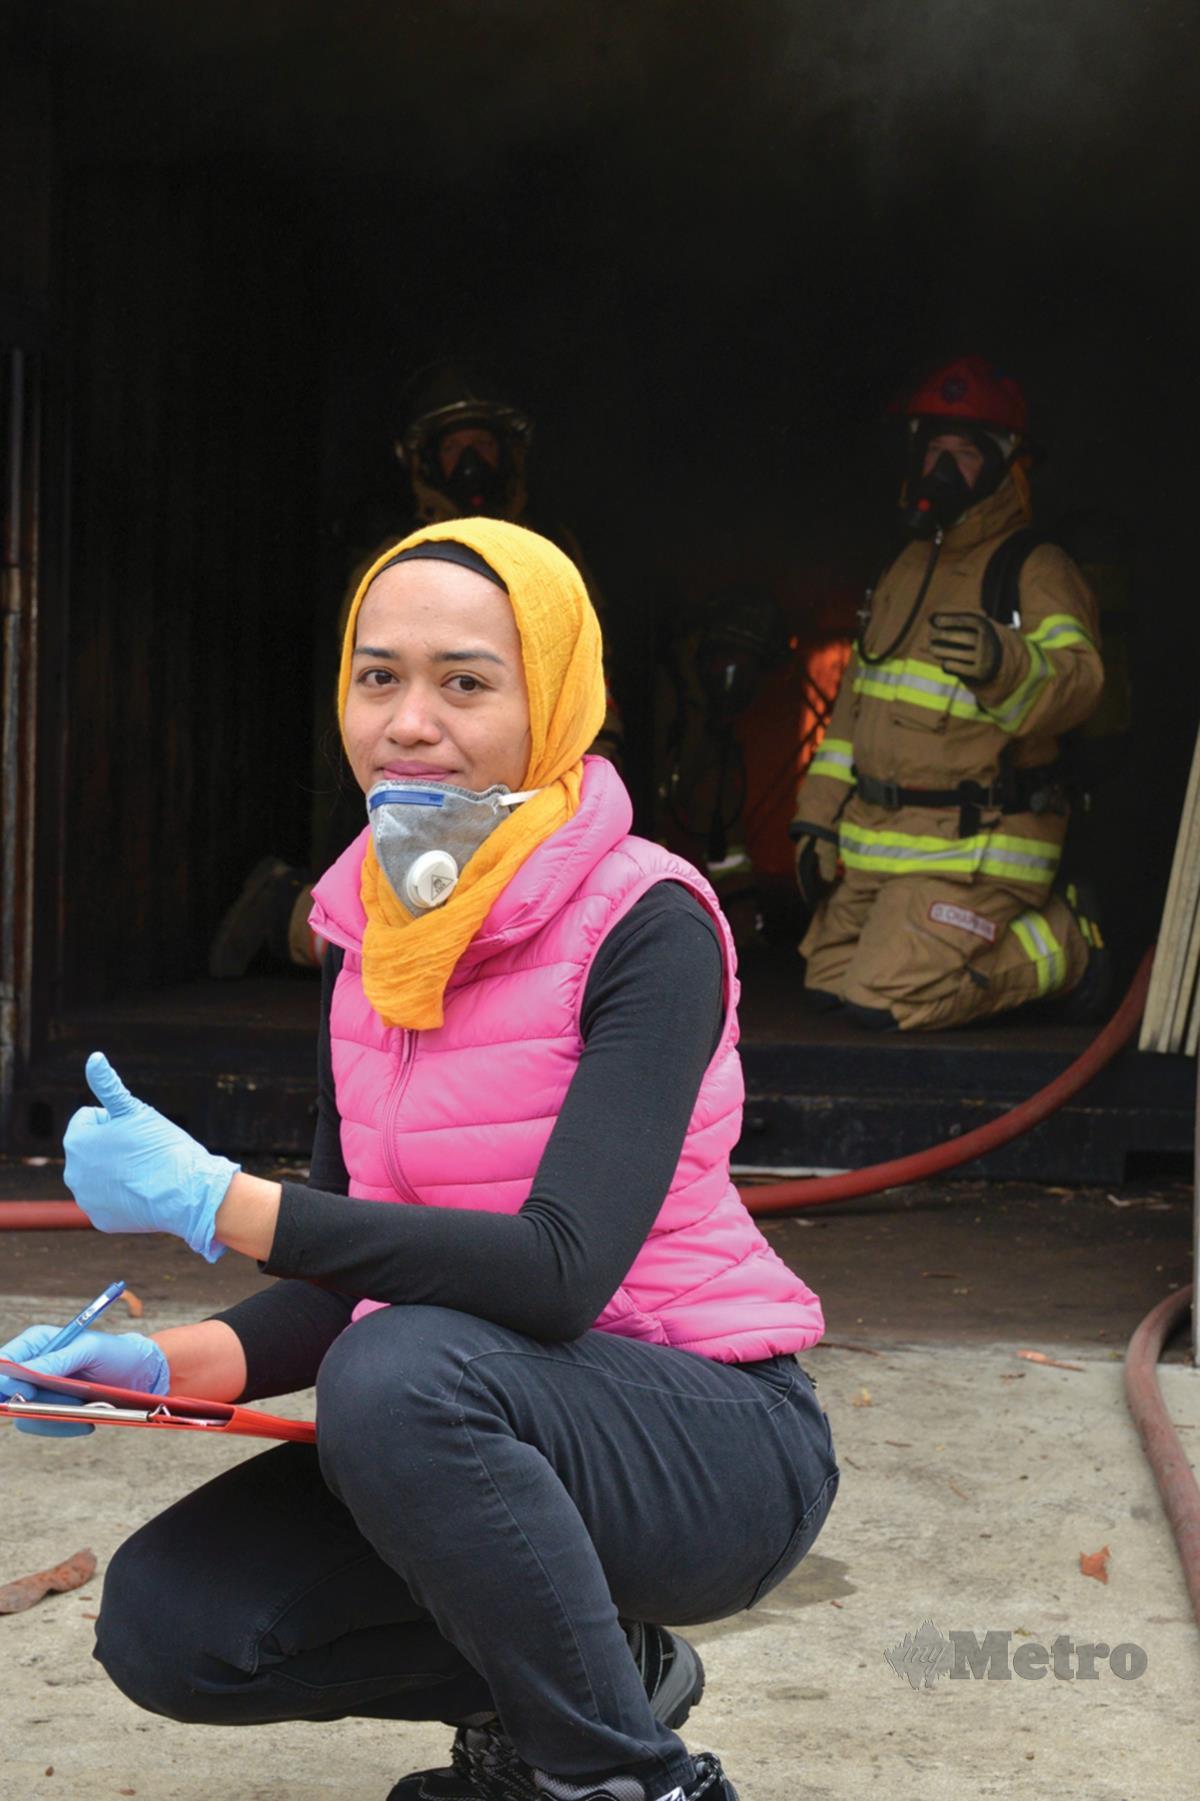 DR Rabiah terbabit dalam simulasi identifikasi mangsa kebakaran dan berkolaborasi dengan South Australian Police, South Australian Country Fire Service dan South Australian Metropolitan Fire Service.